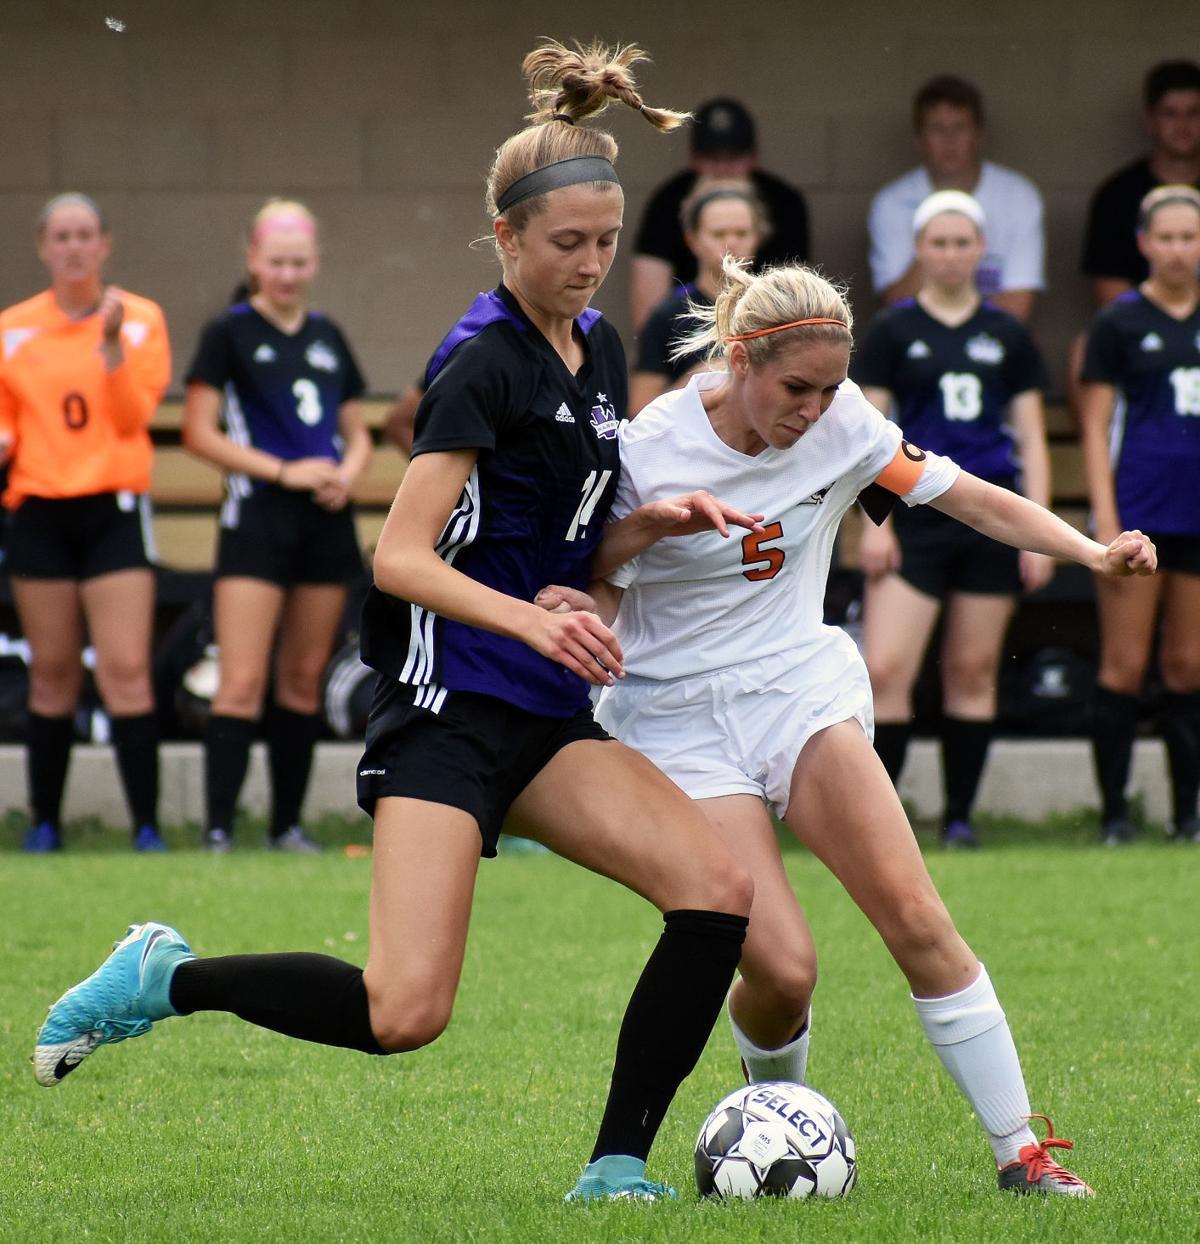 Waunakee's Isabelle Barmore, Oregon's Emma Krause battle for possession